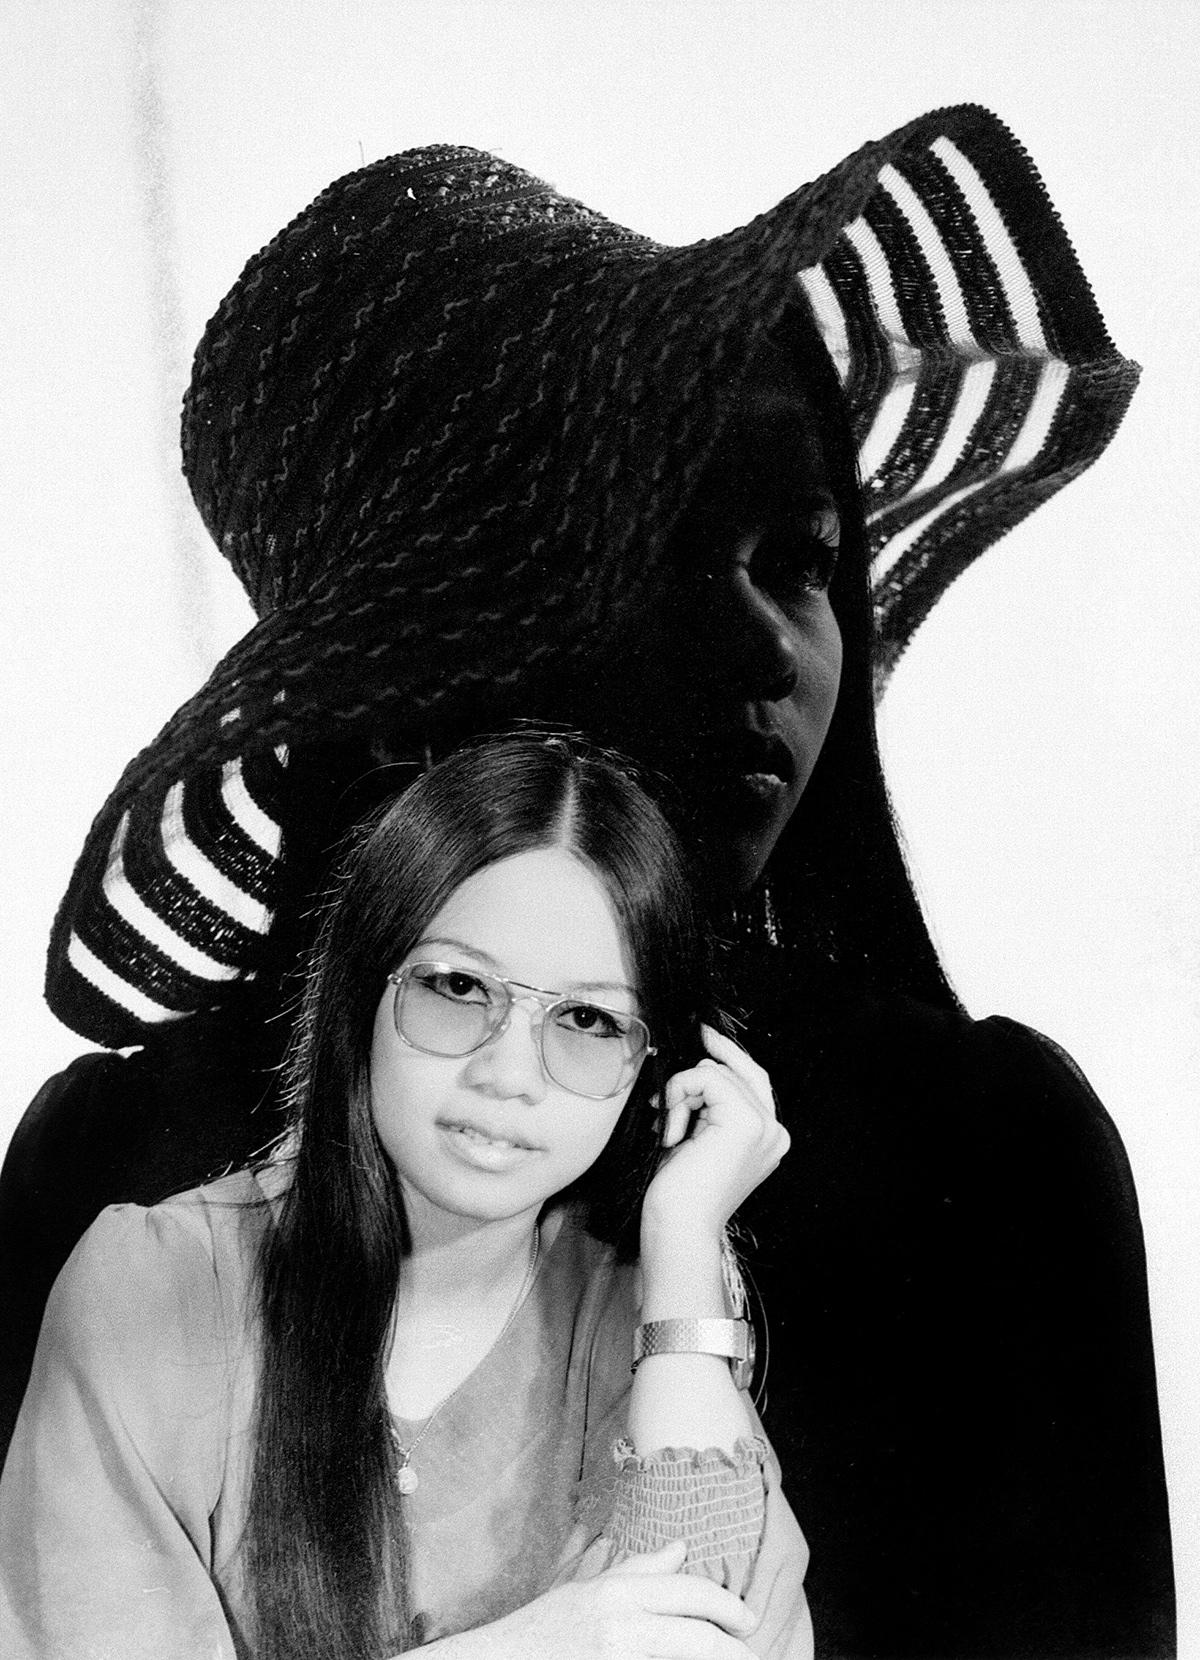 Double exposed  negative. Bellay Studio. Yangon, 1970s. Taken by Har Si Yone, Bellay Photo Studio, Yangon 1970s.